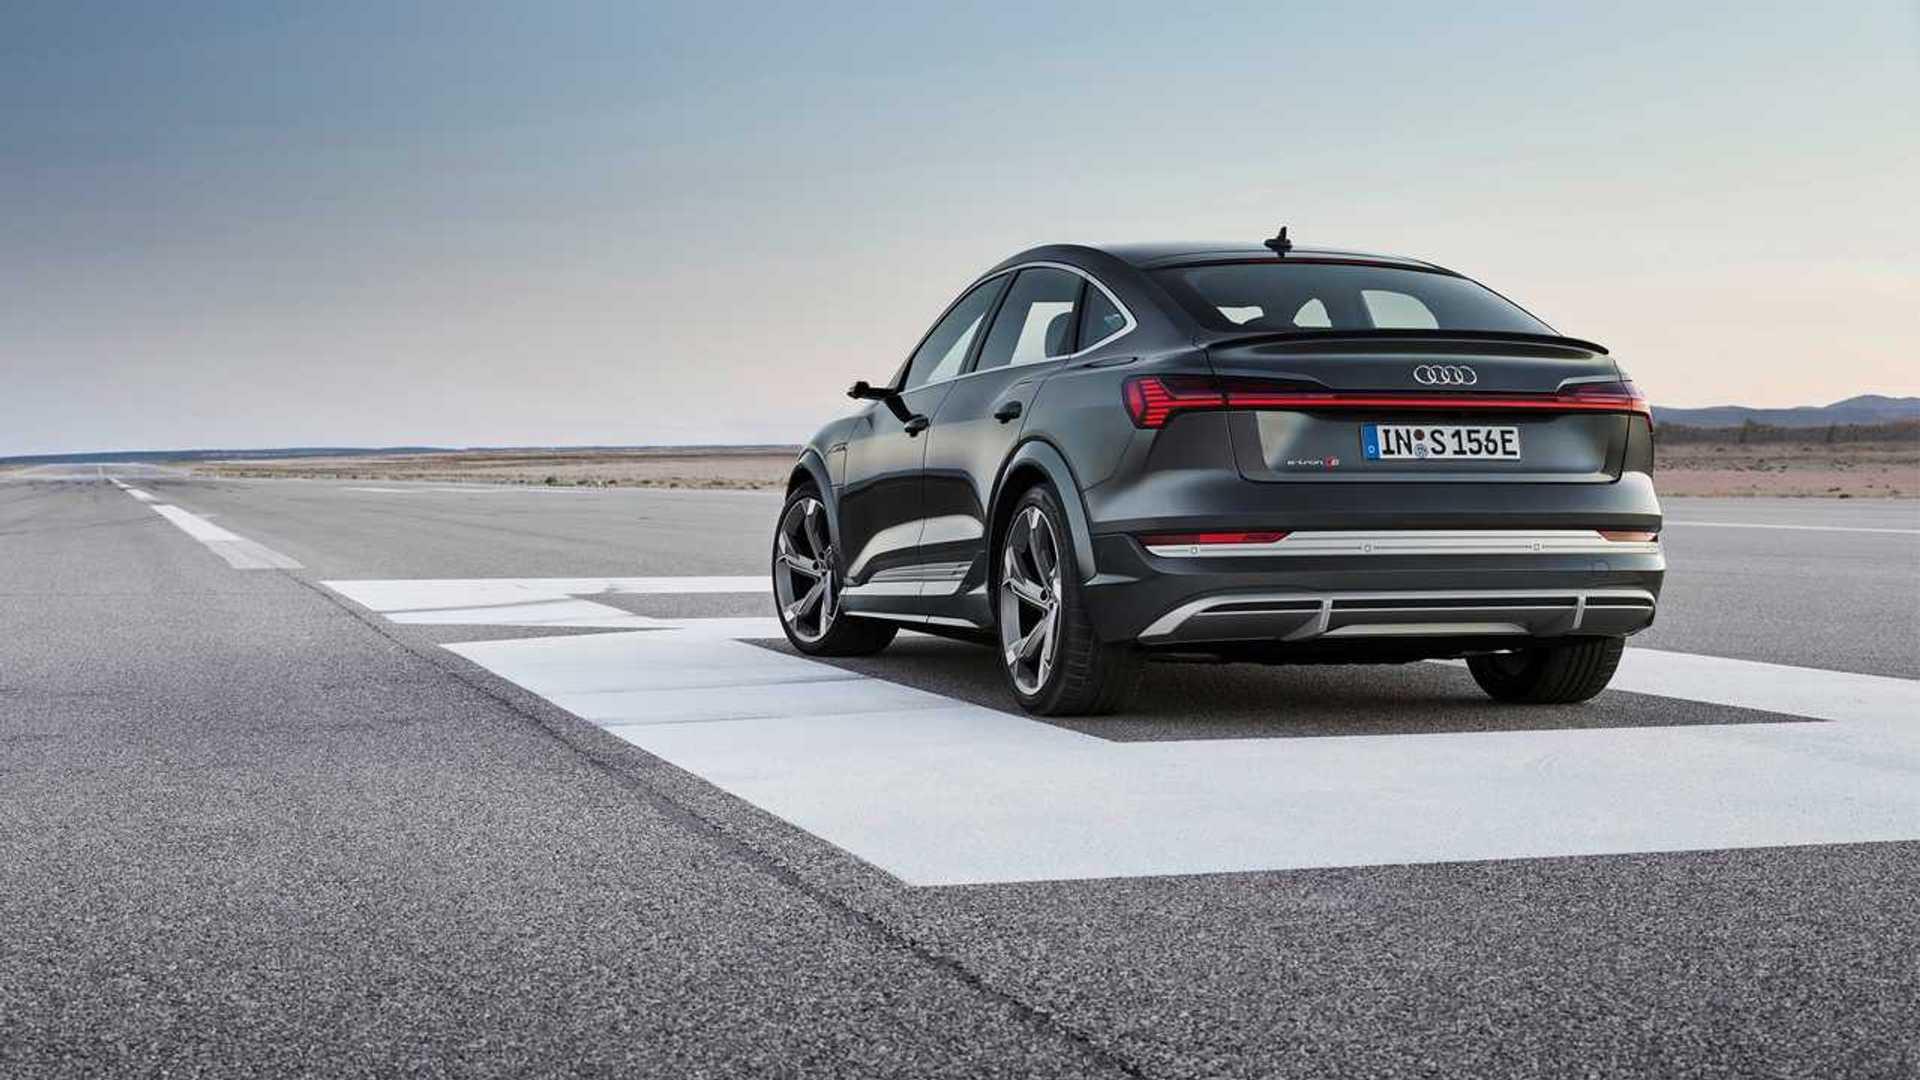 2020 - [Audi] E-Tron Sportback - Page 4 Audi-e-tron-s-sportback